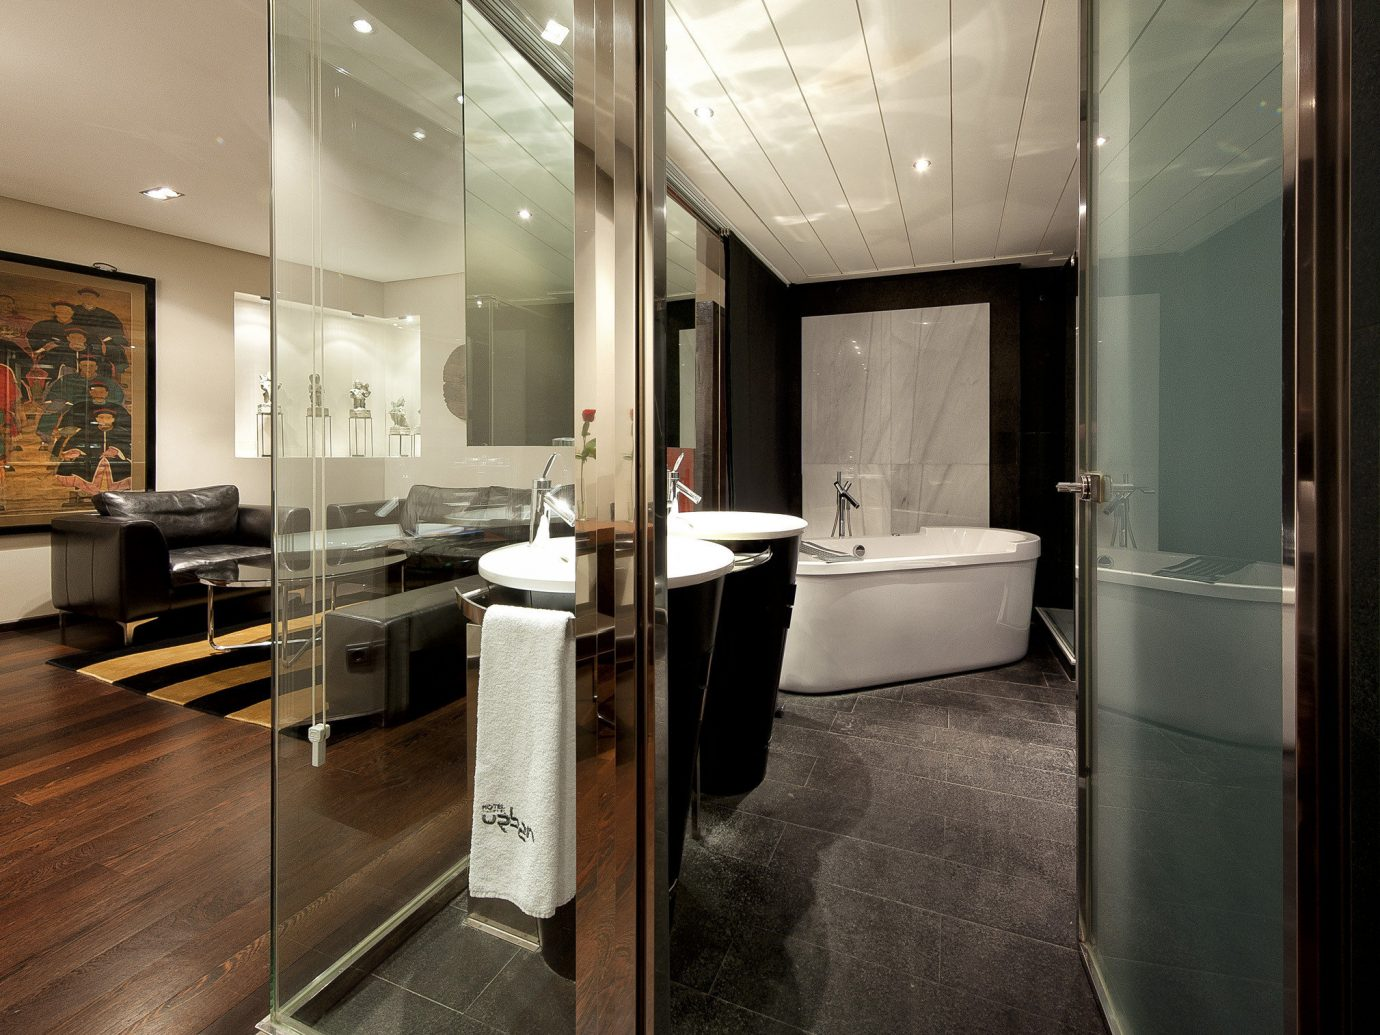 Hotels Madrid Spain floor indoor wall room property building interior design home Design Suite estate